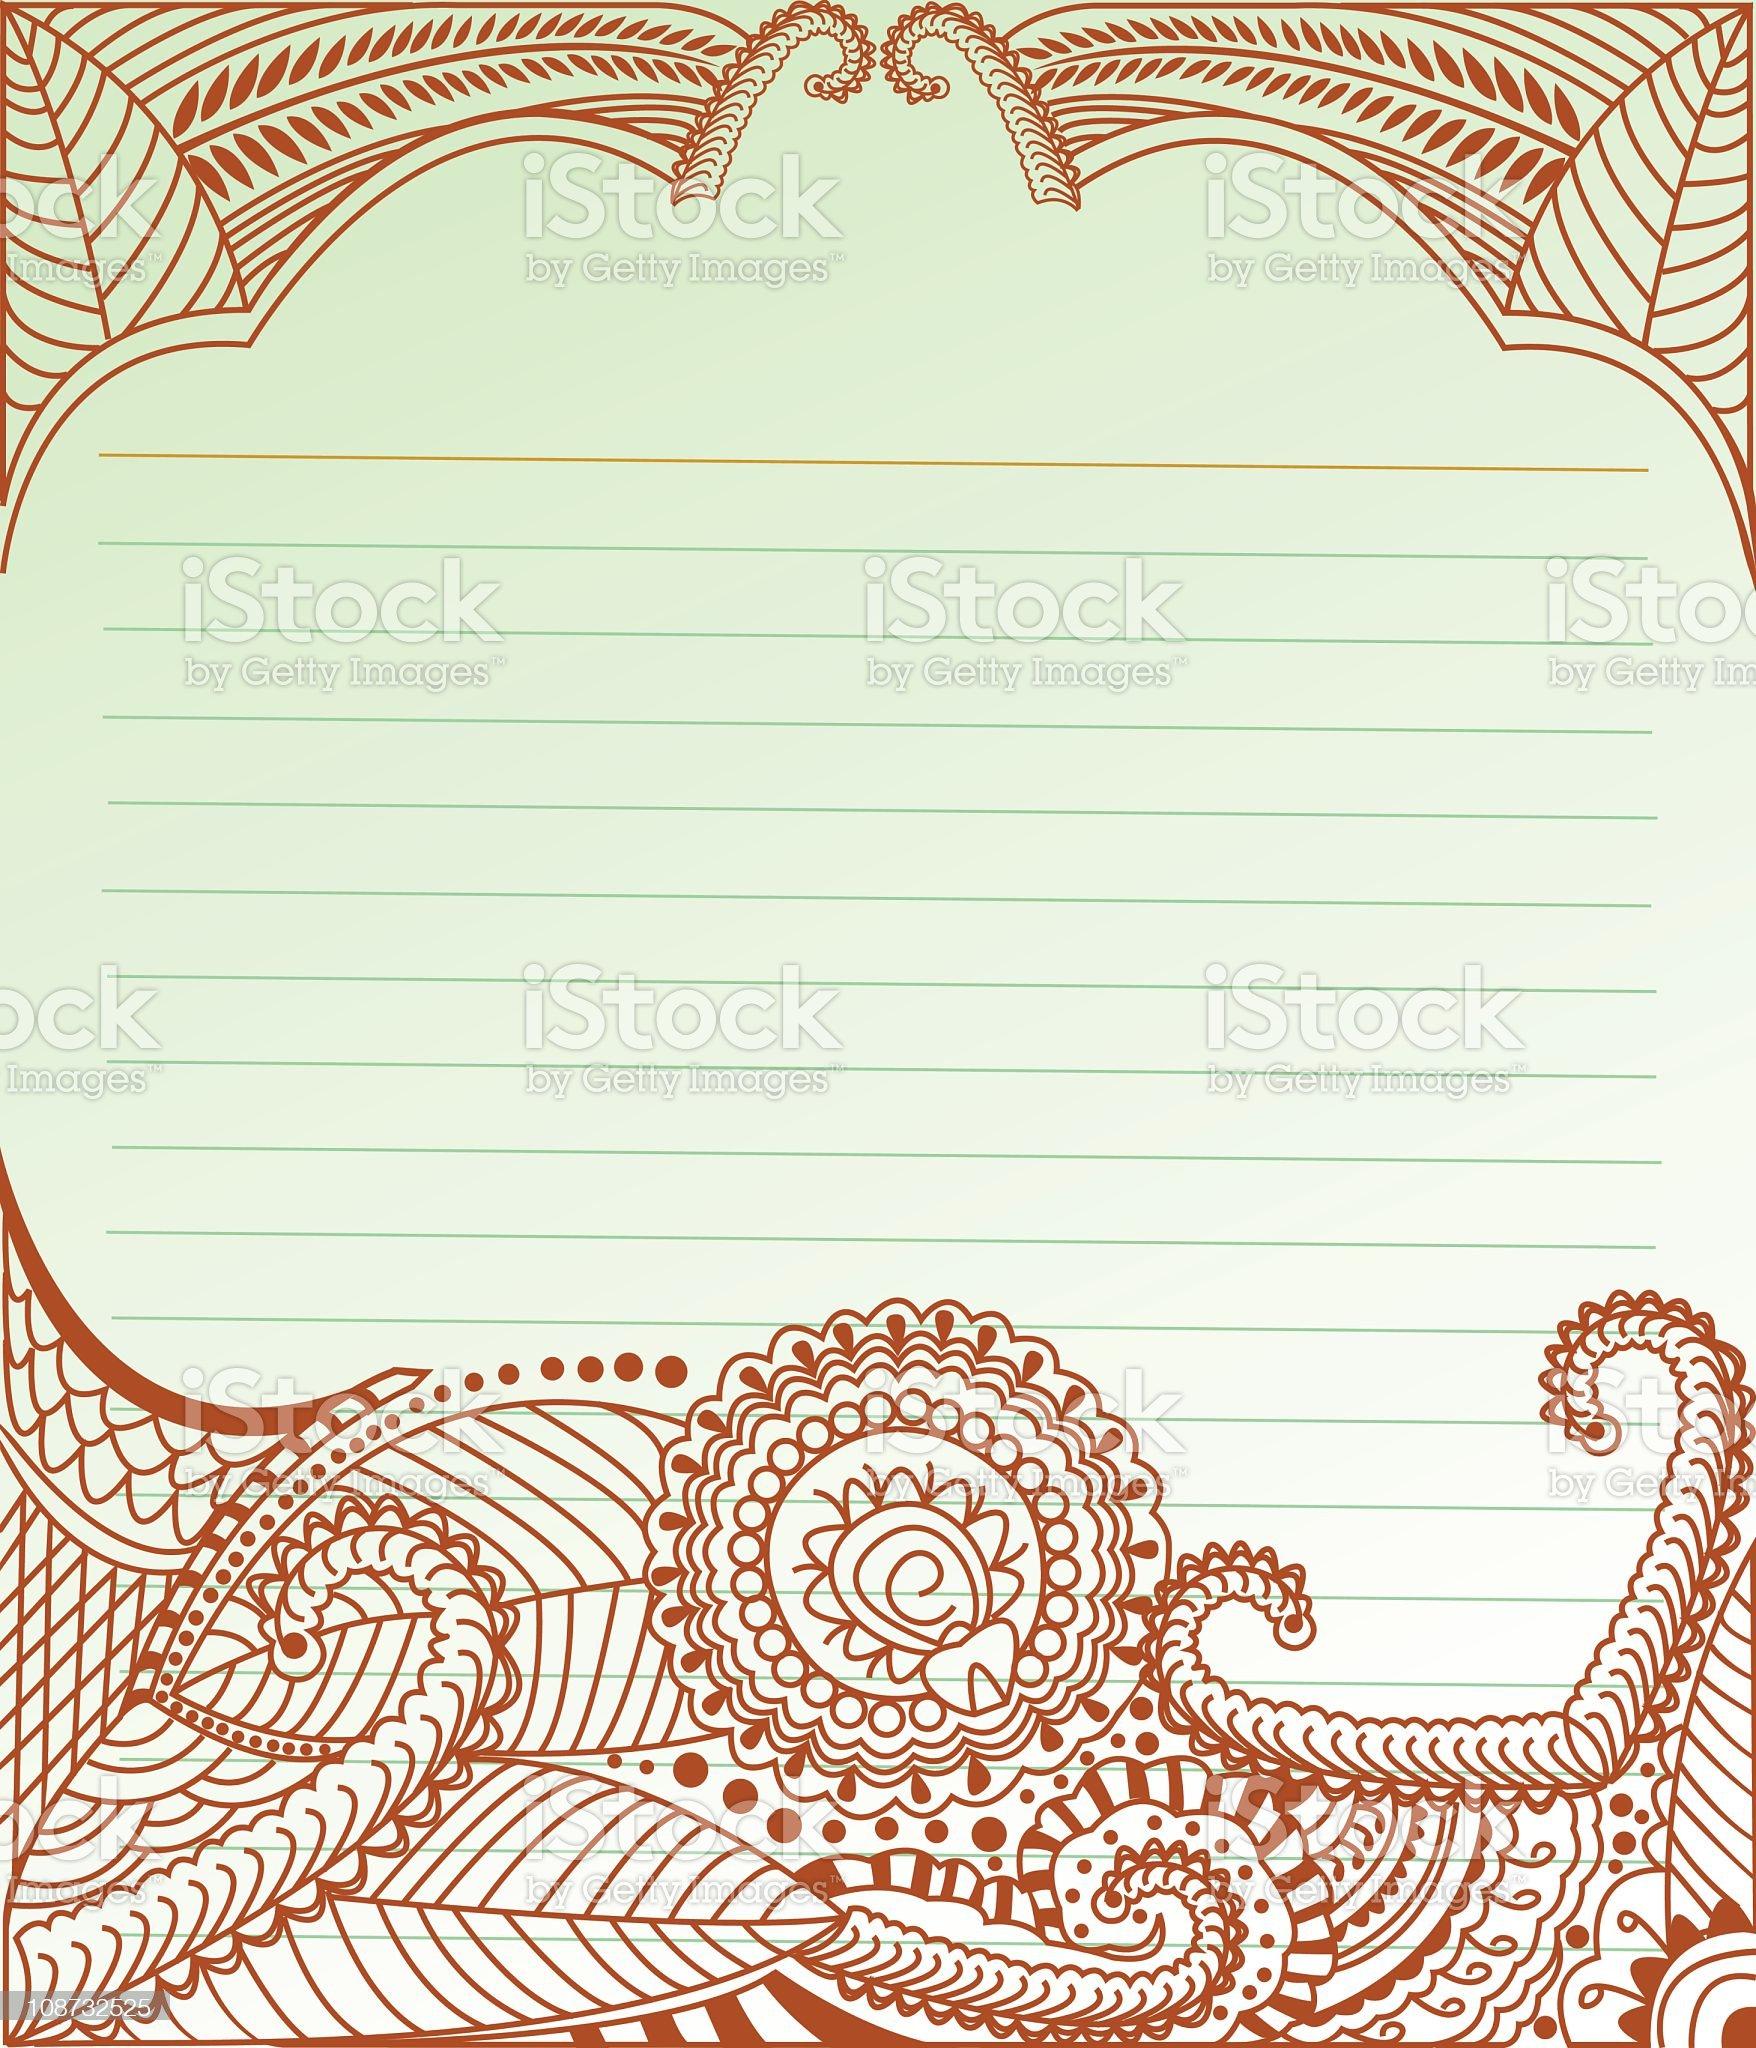 Decorative Doodle royalty-free stock vector art